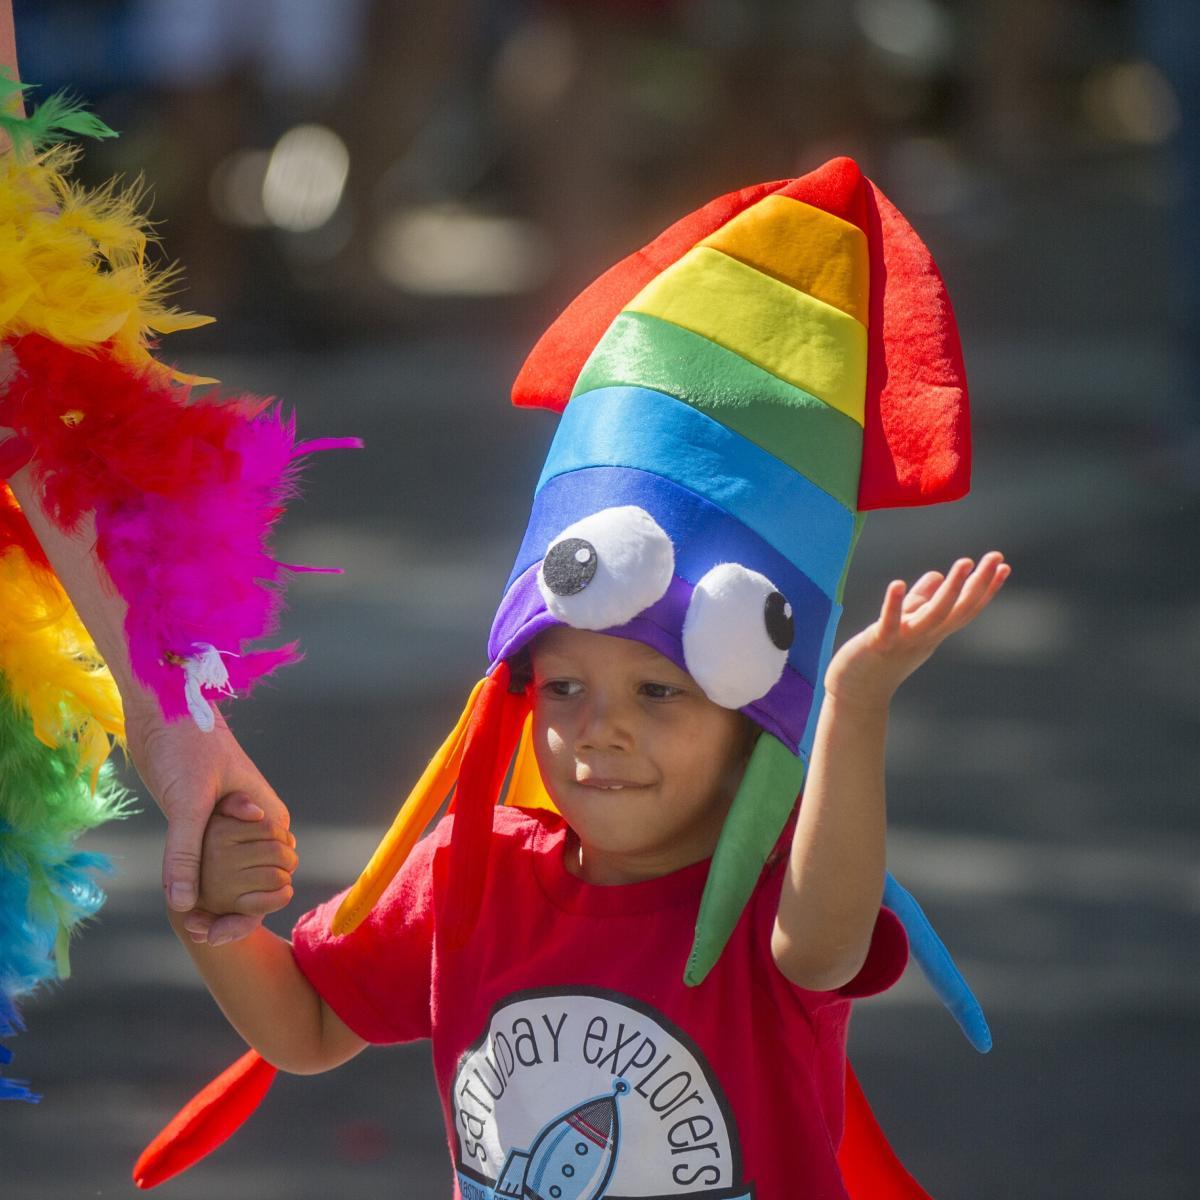 Copy of pridefest-2016-boy-rainbow-hat